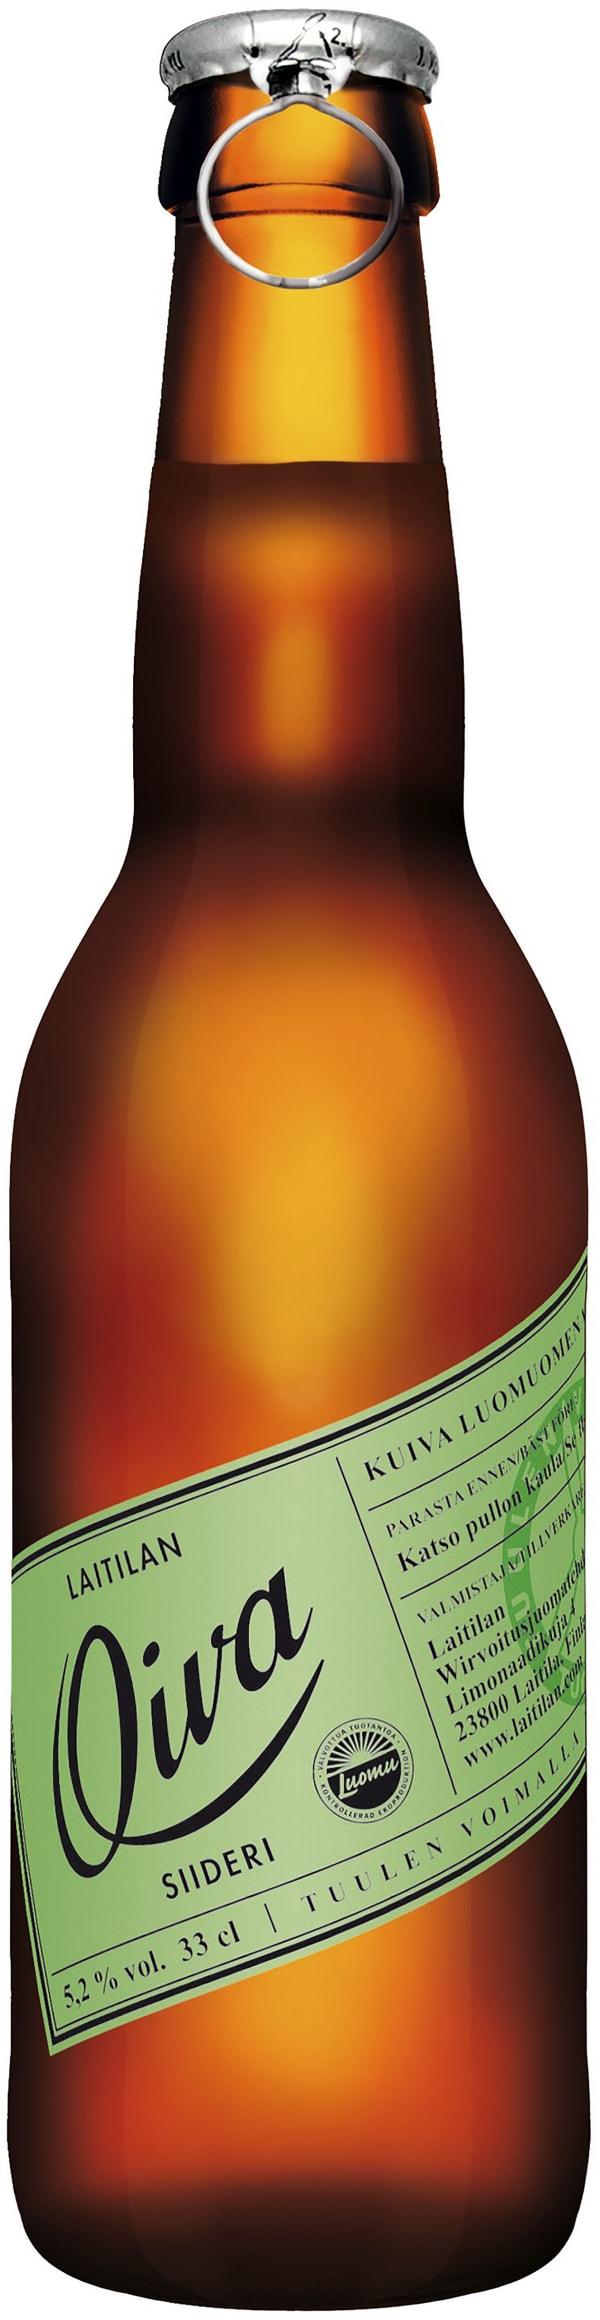 Laitilan Oiva Nordic Cider Organic Apple Dry